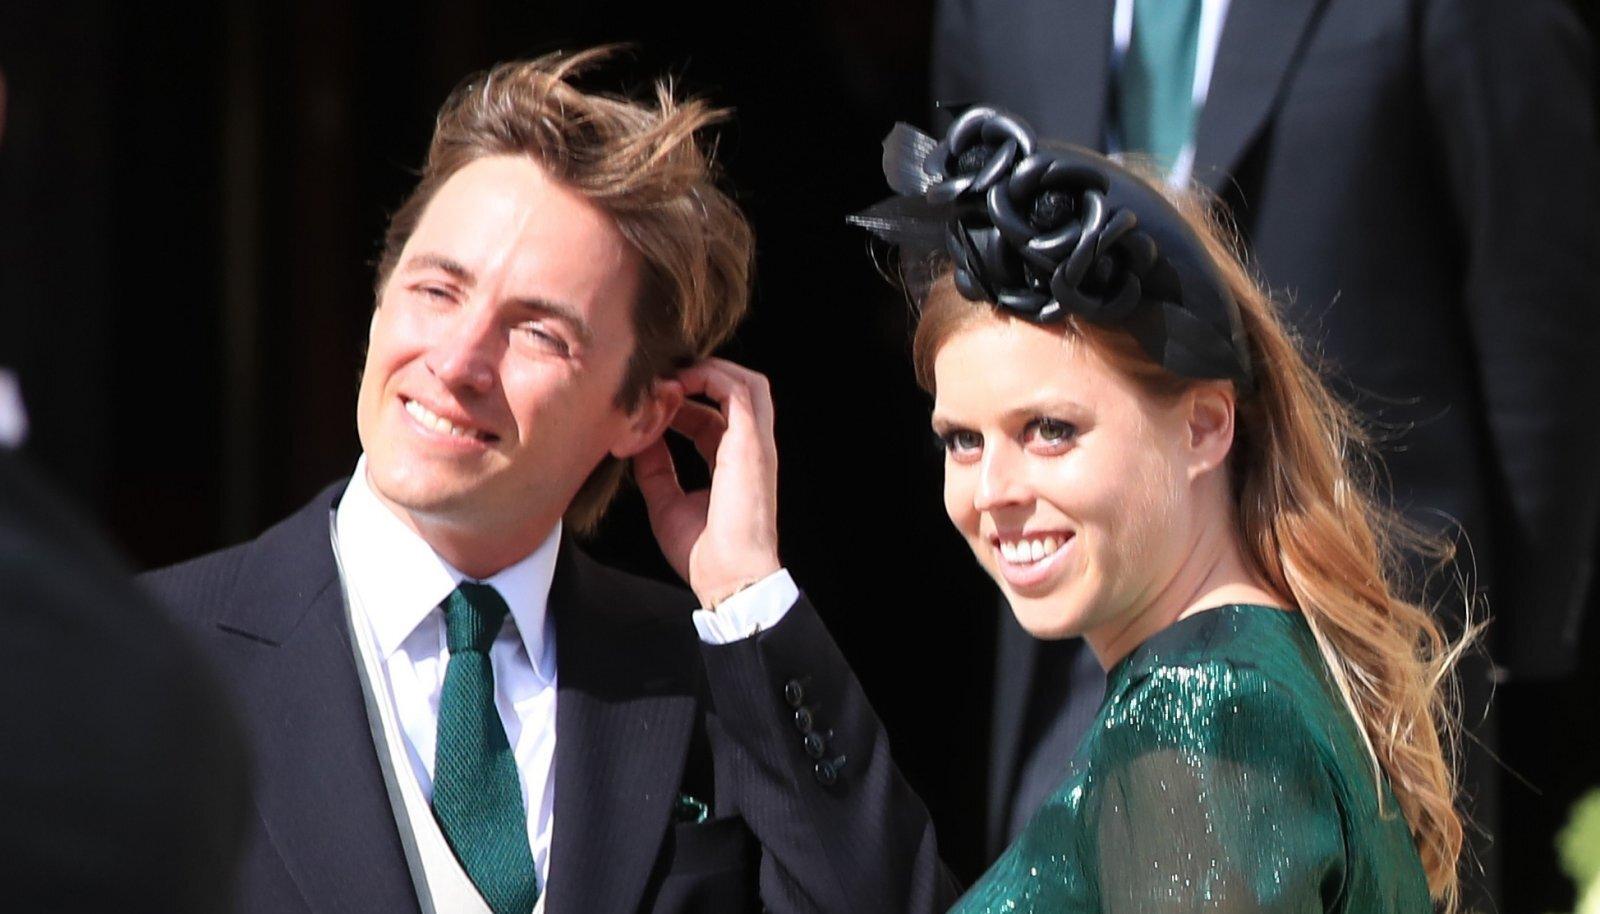 Принцесса тайно вышла замуж за итальянского графа Мапелли-Моцци в июле 2020 года